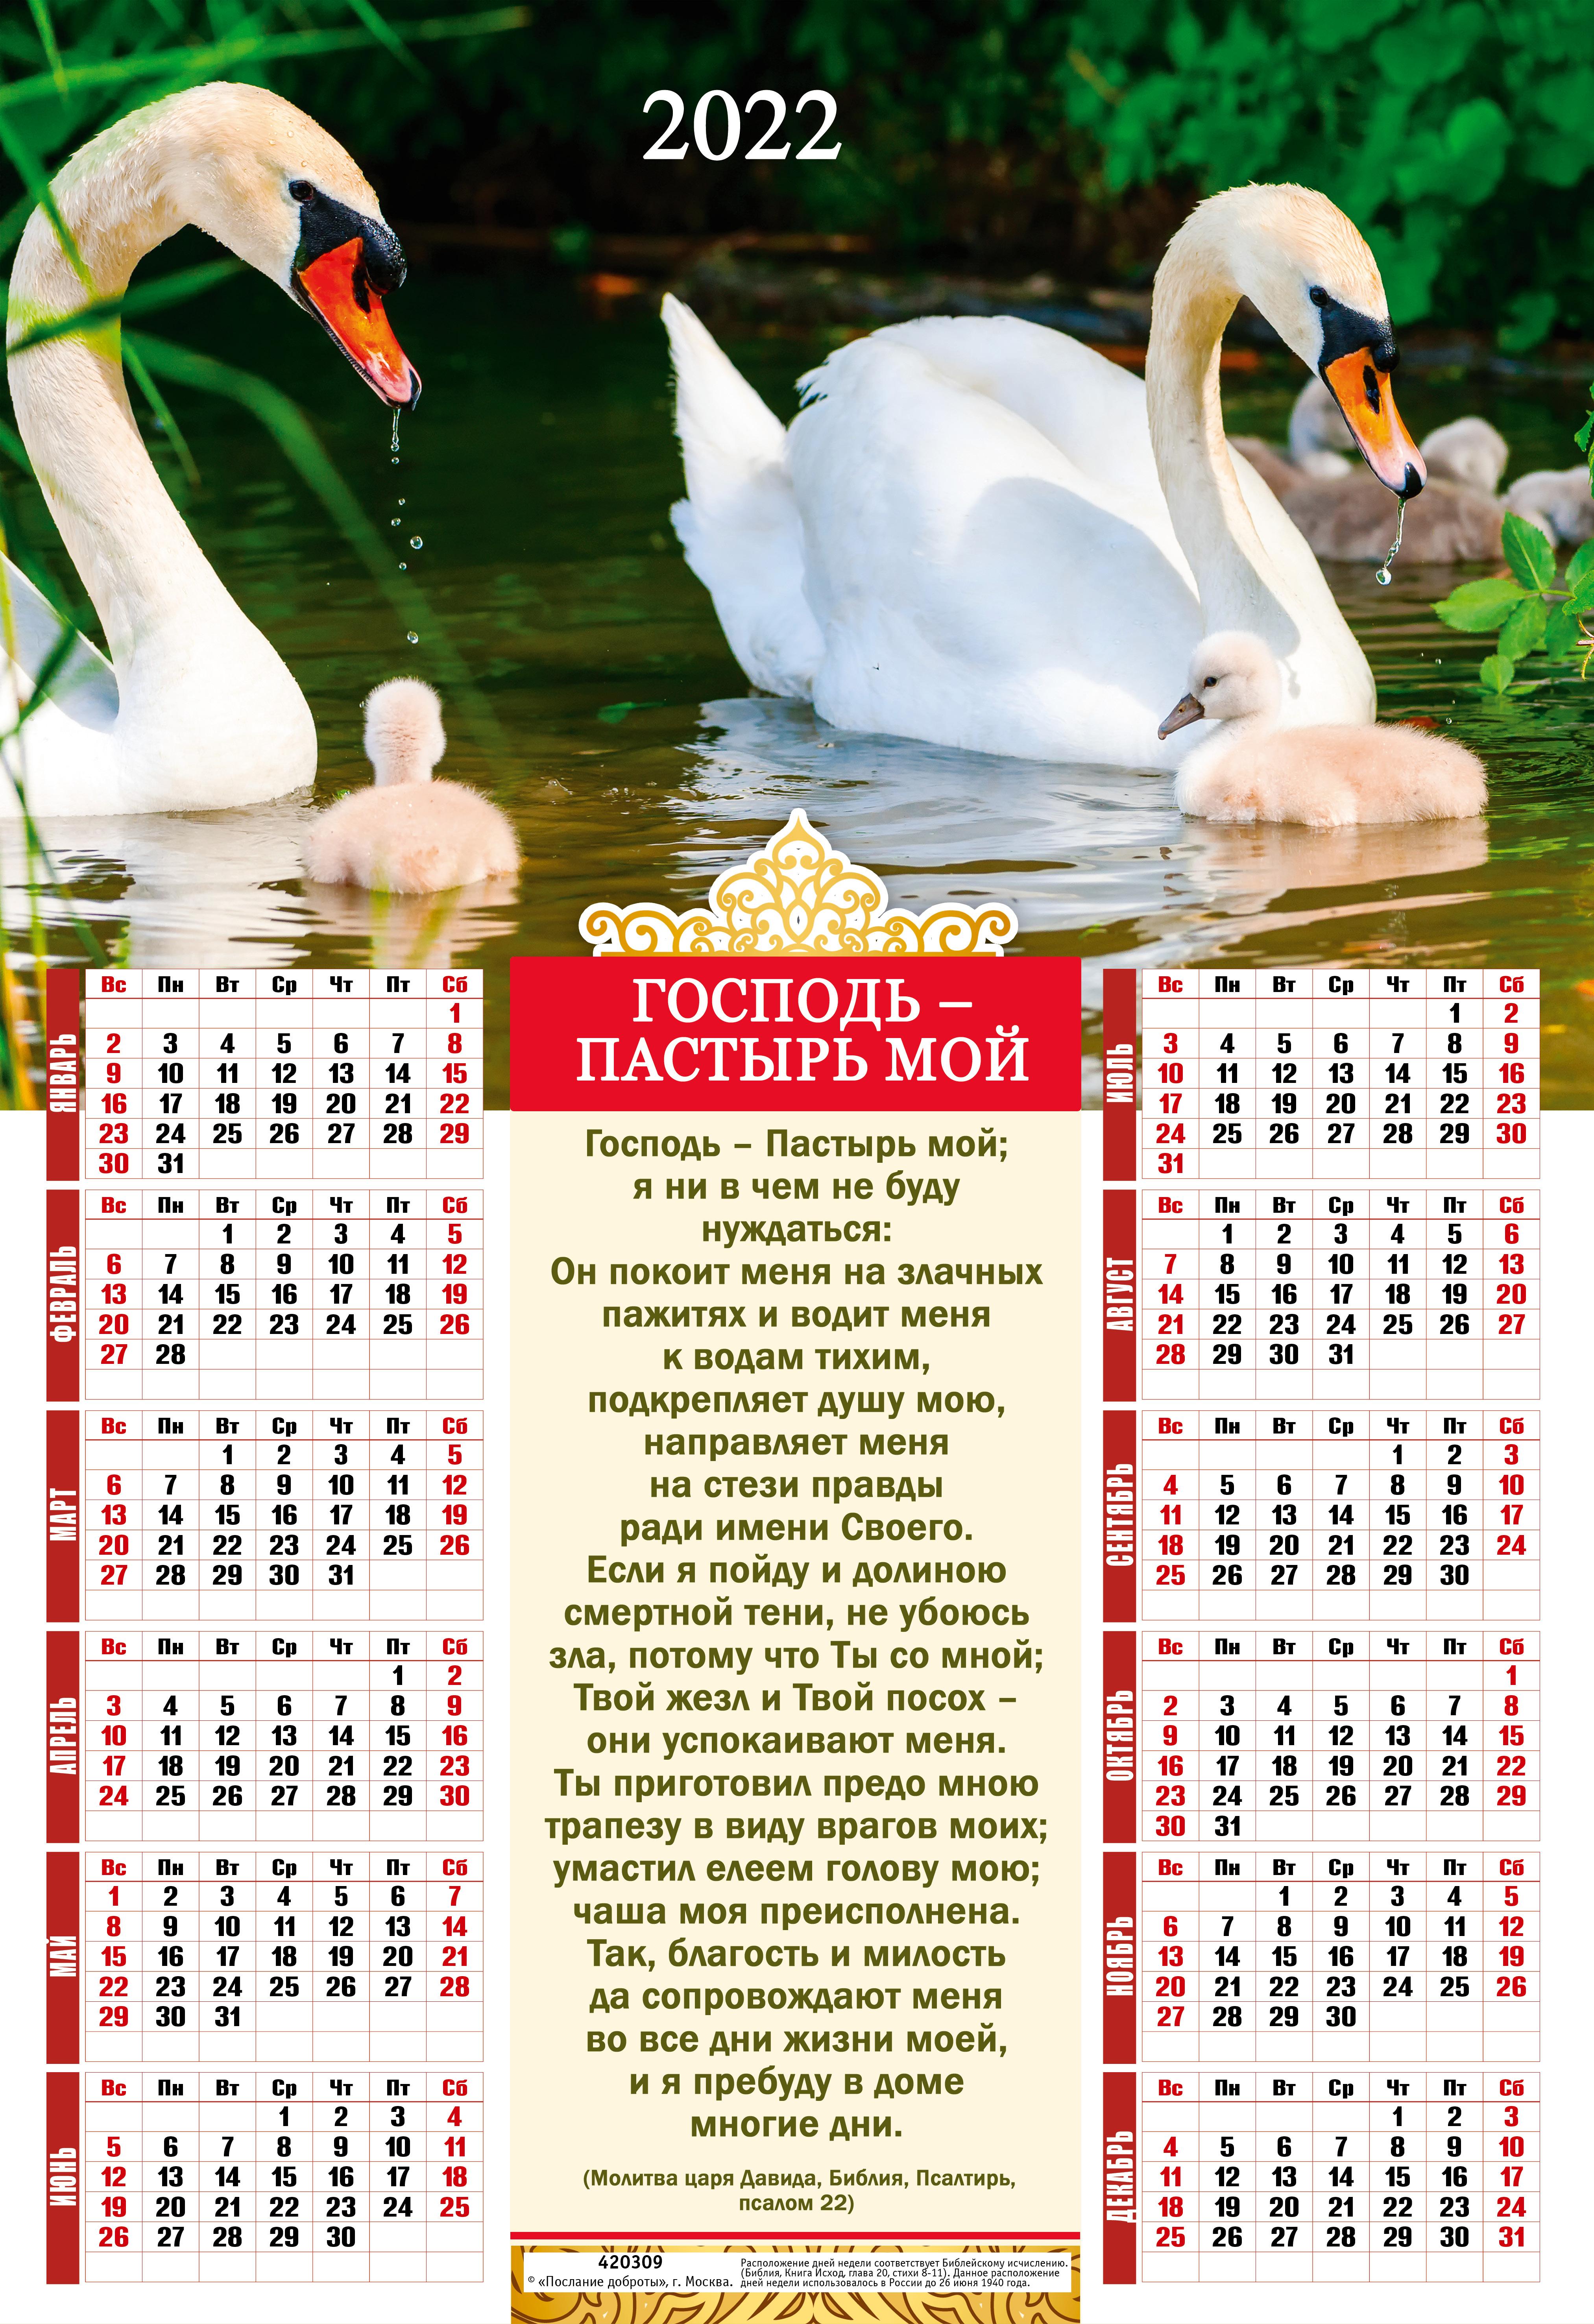 Листовые календари 2022